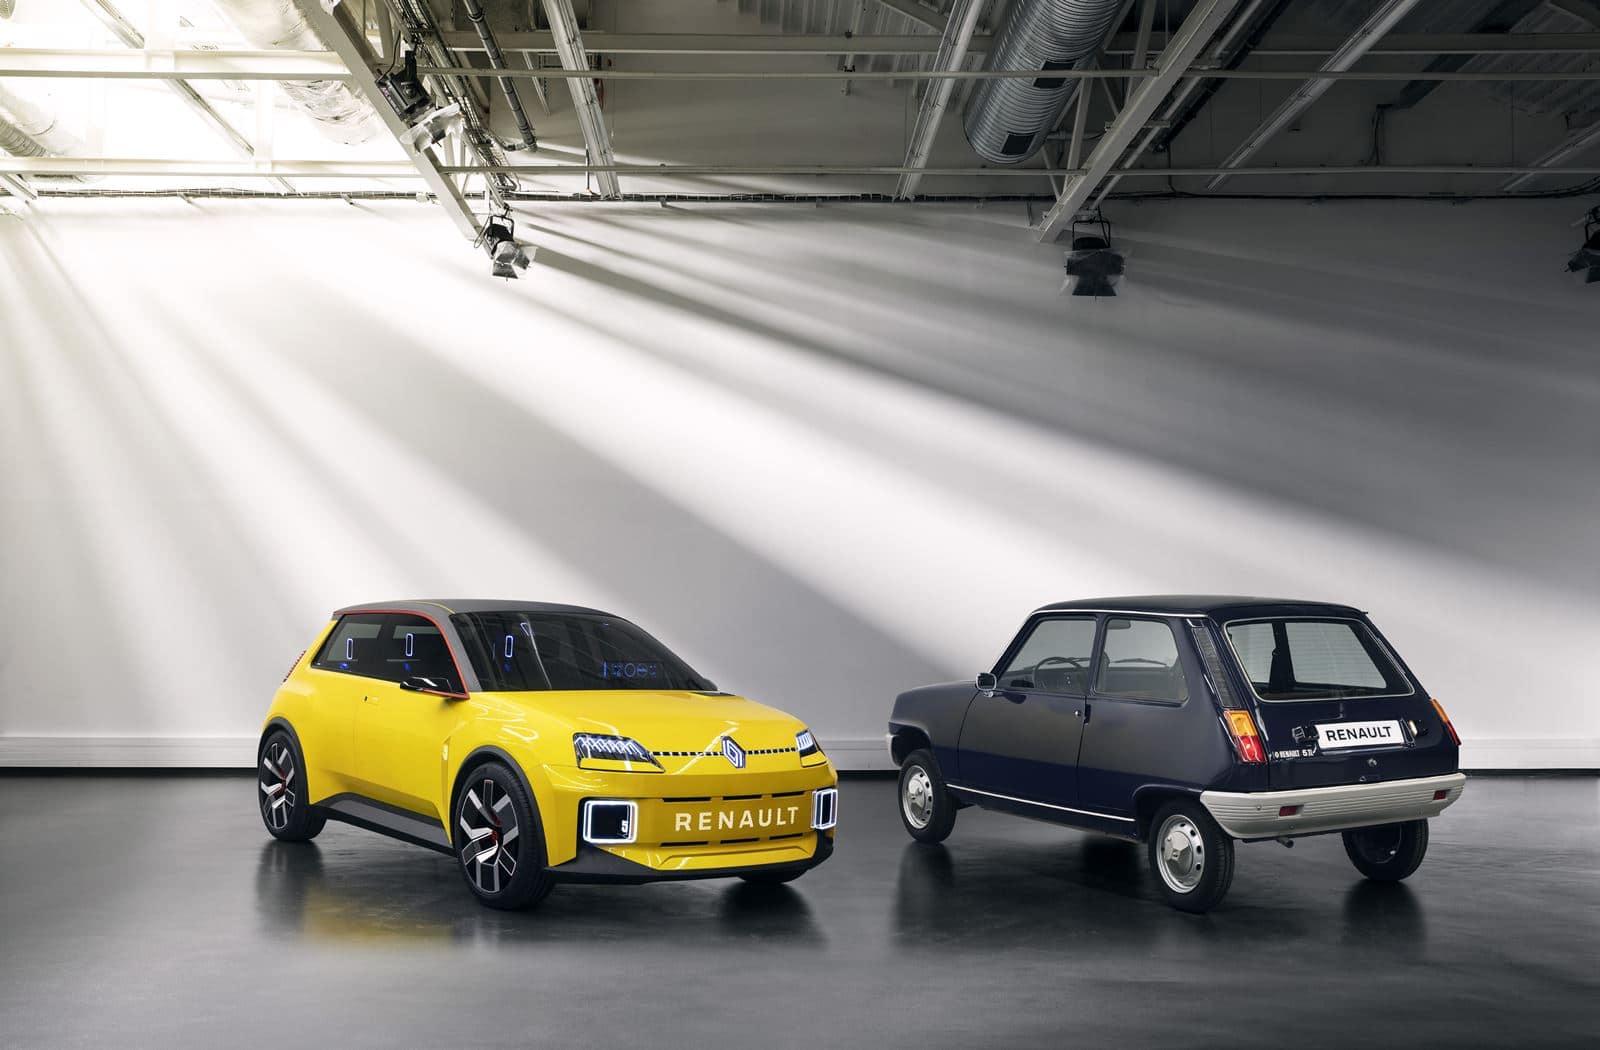 Nuevo Renault 5 vs viejo Renault 5